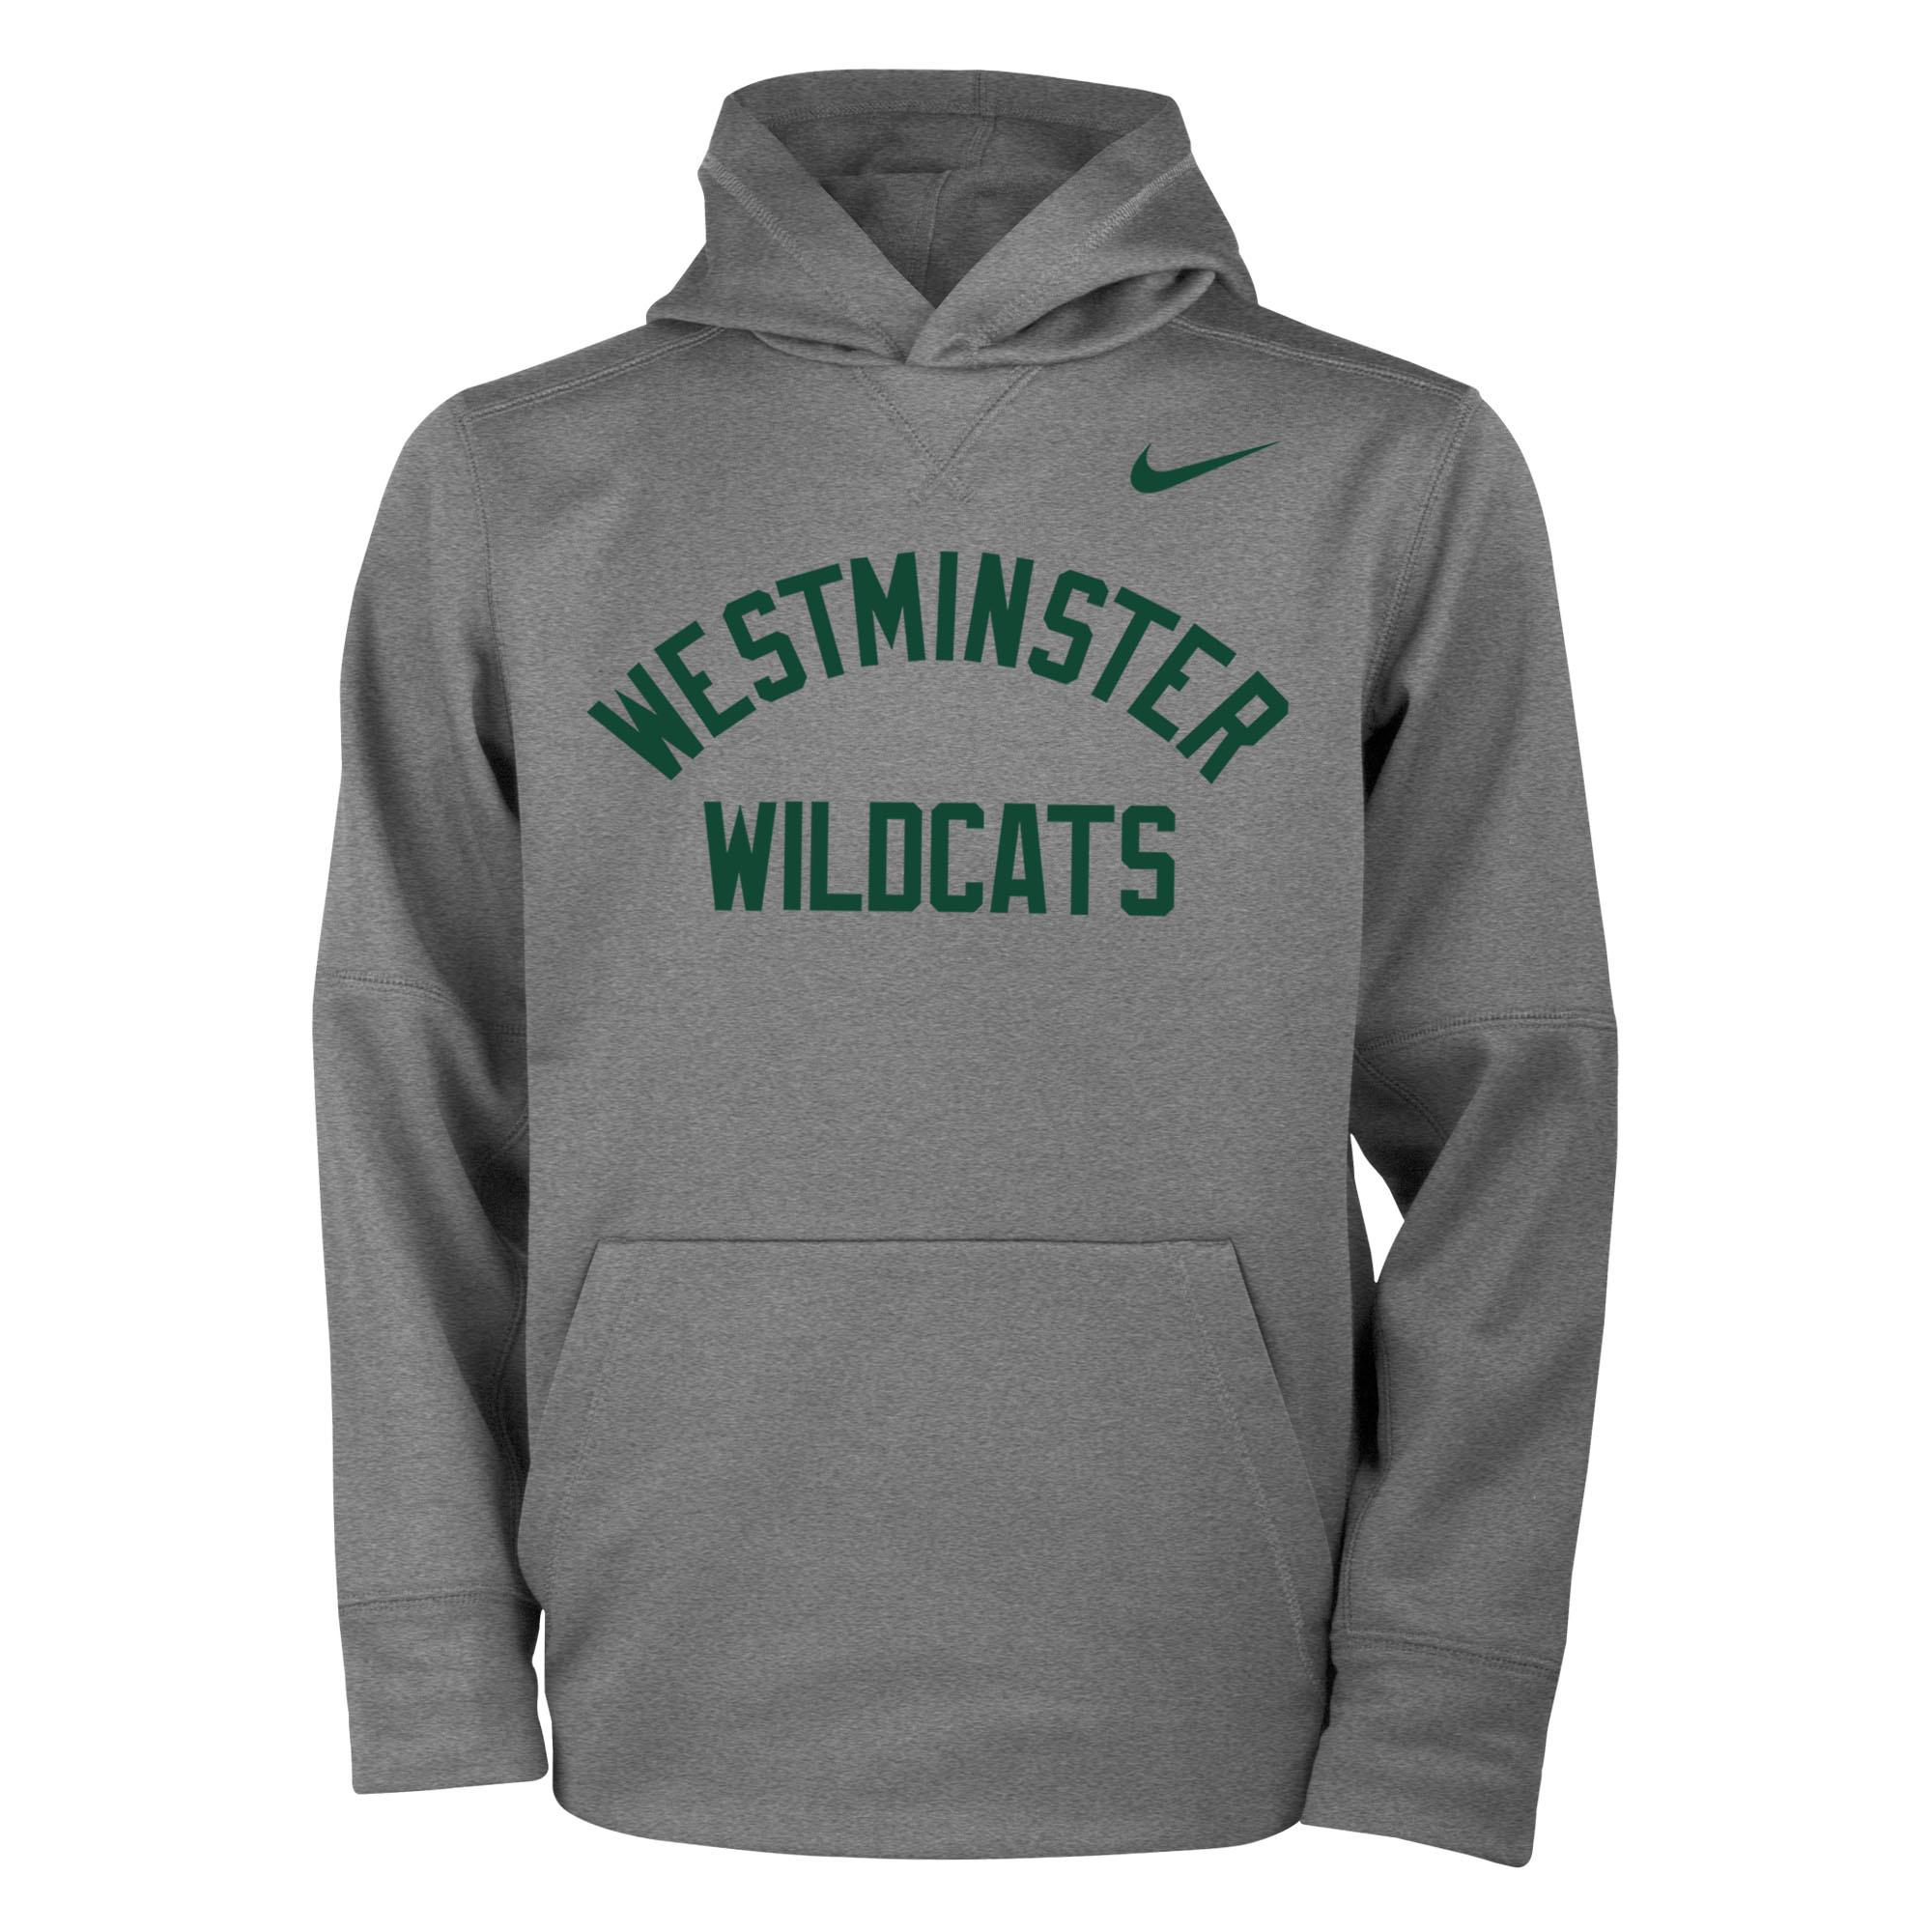 Nike Sweatshirt: Therma PO Hoody Gray w/green lettering